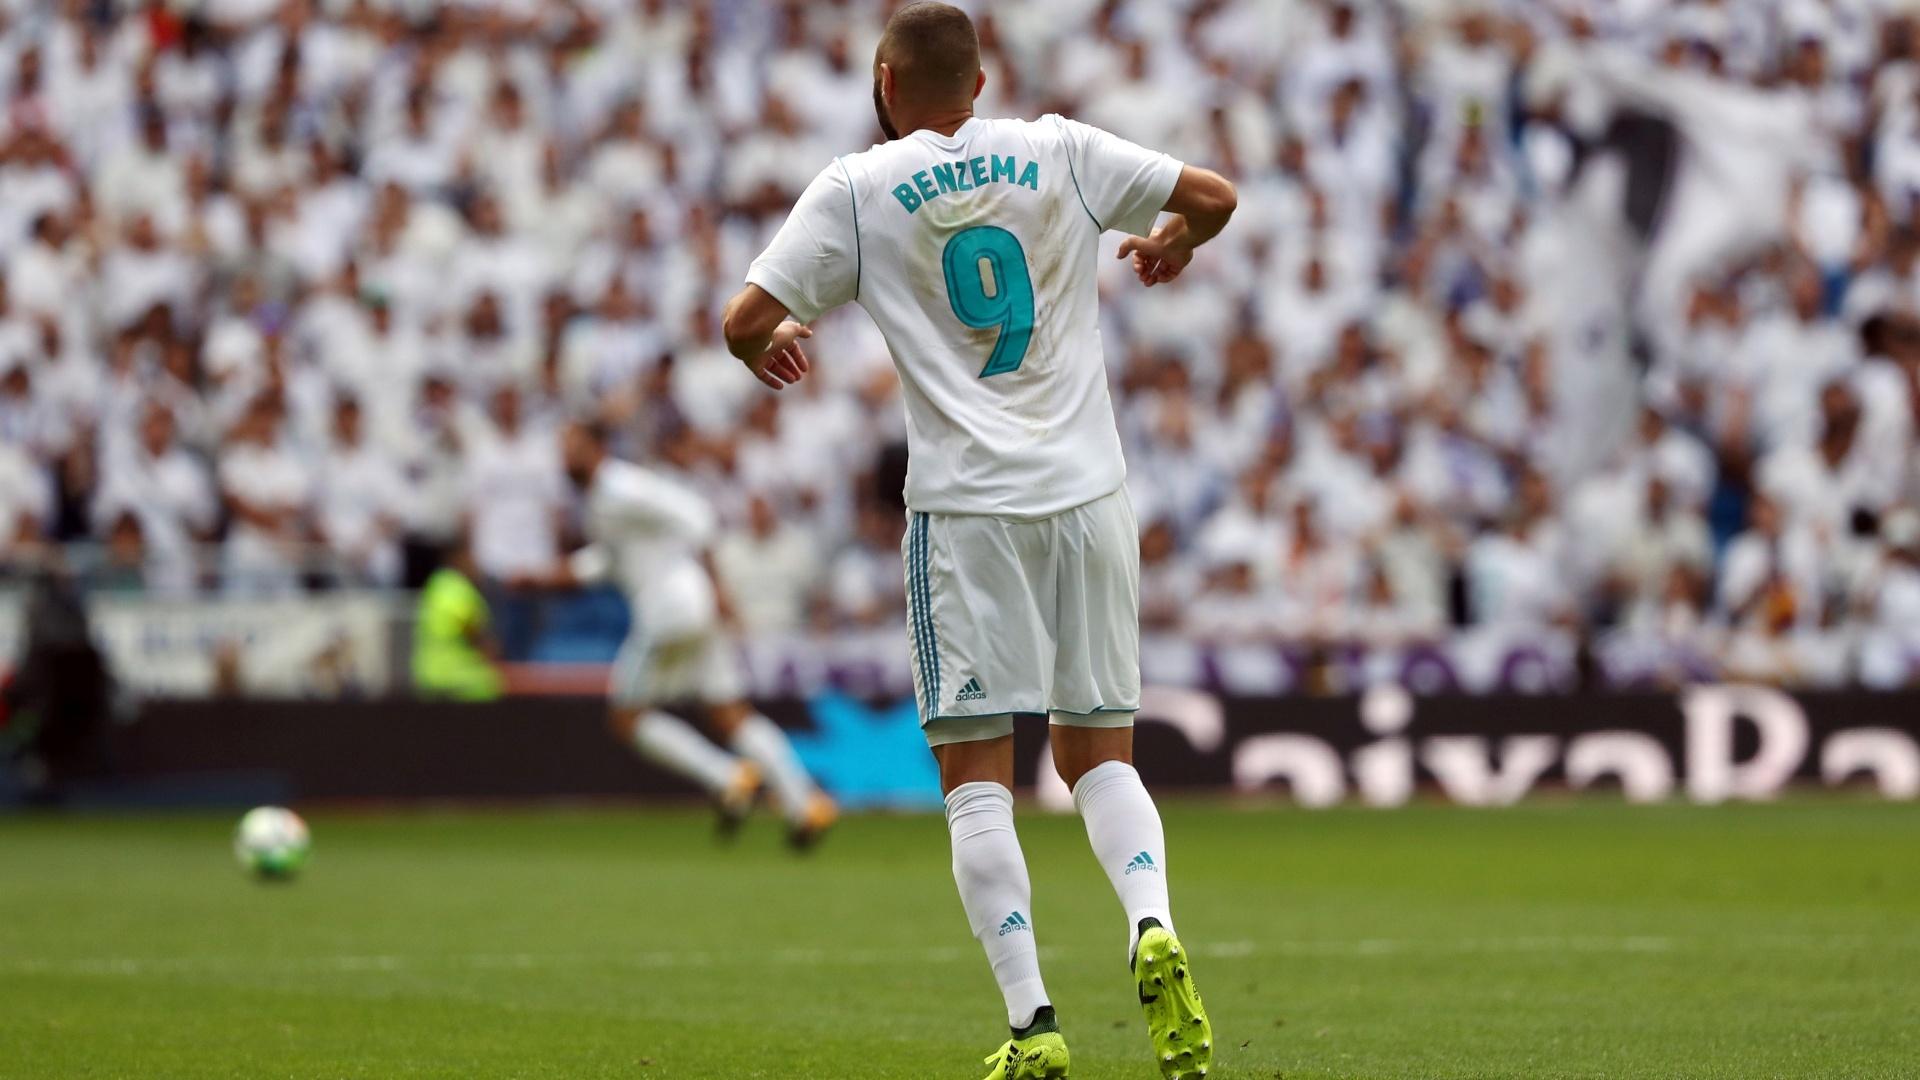 Benzema foi substituído ainda no primeiro tempo contra o Levante